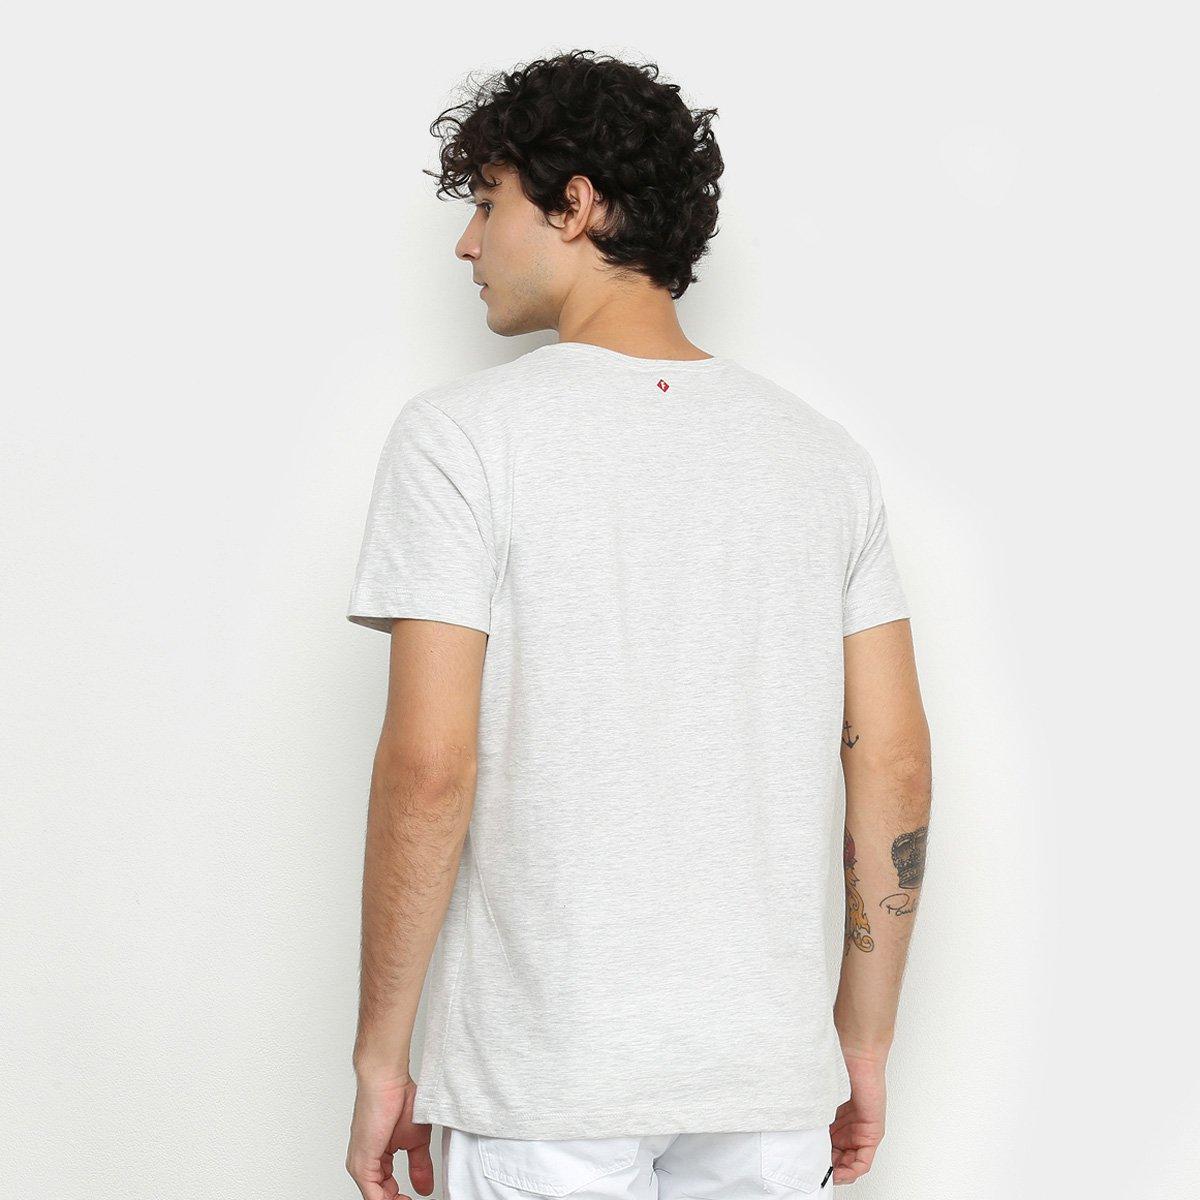 Camiseta Forum Básica Original Clothing Masculina - Mescla Claro